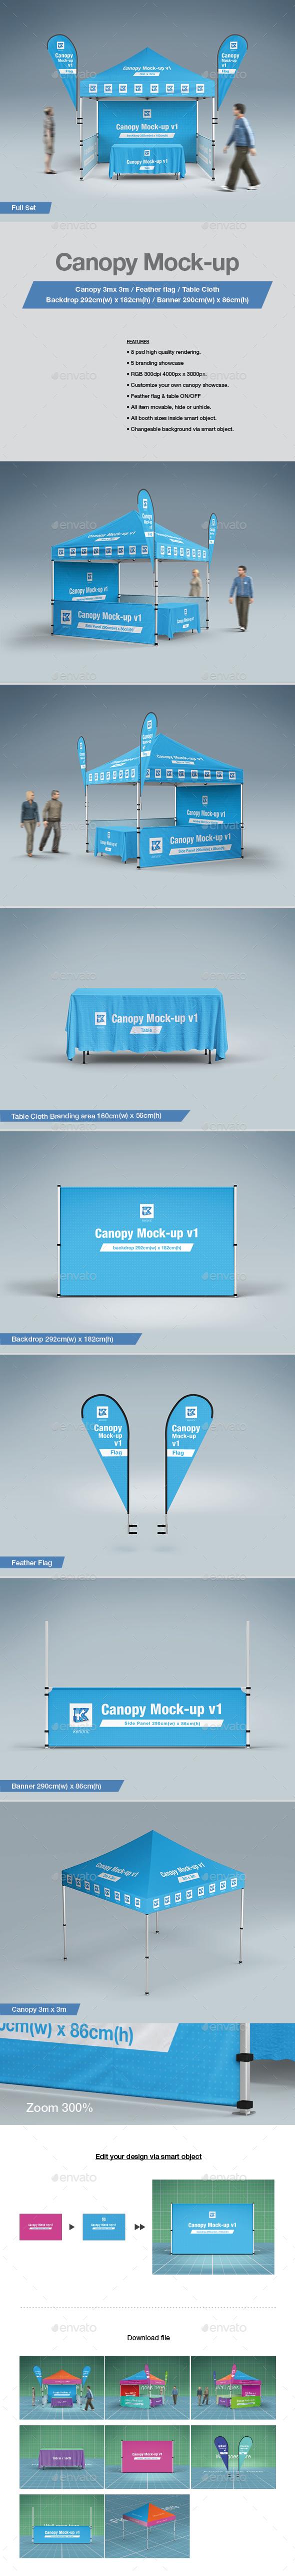 Canopy Mock-up